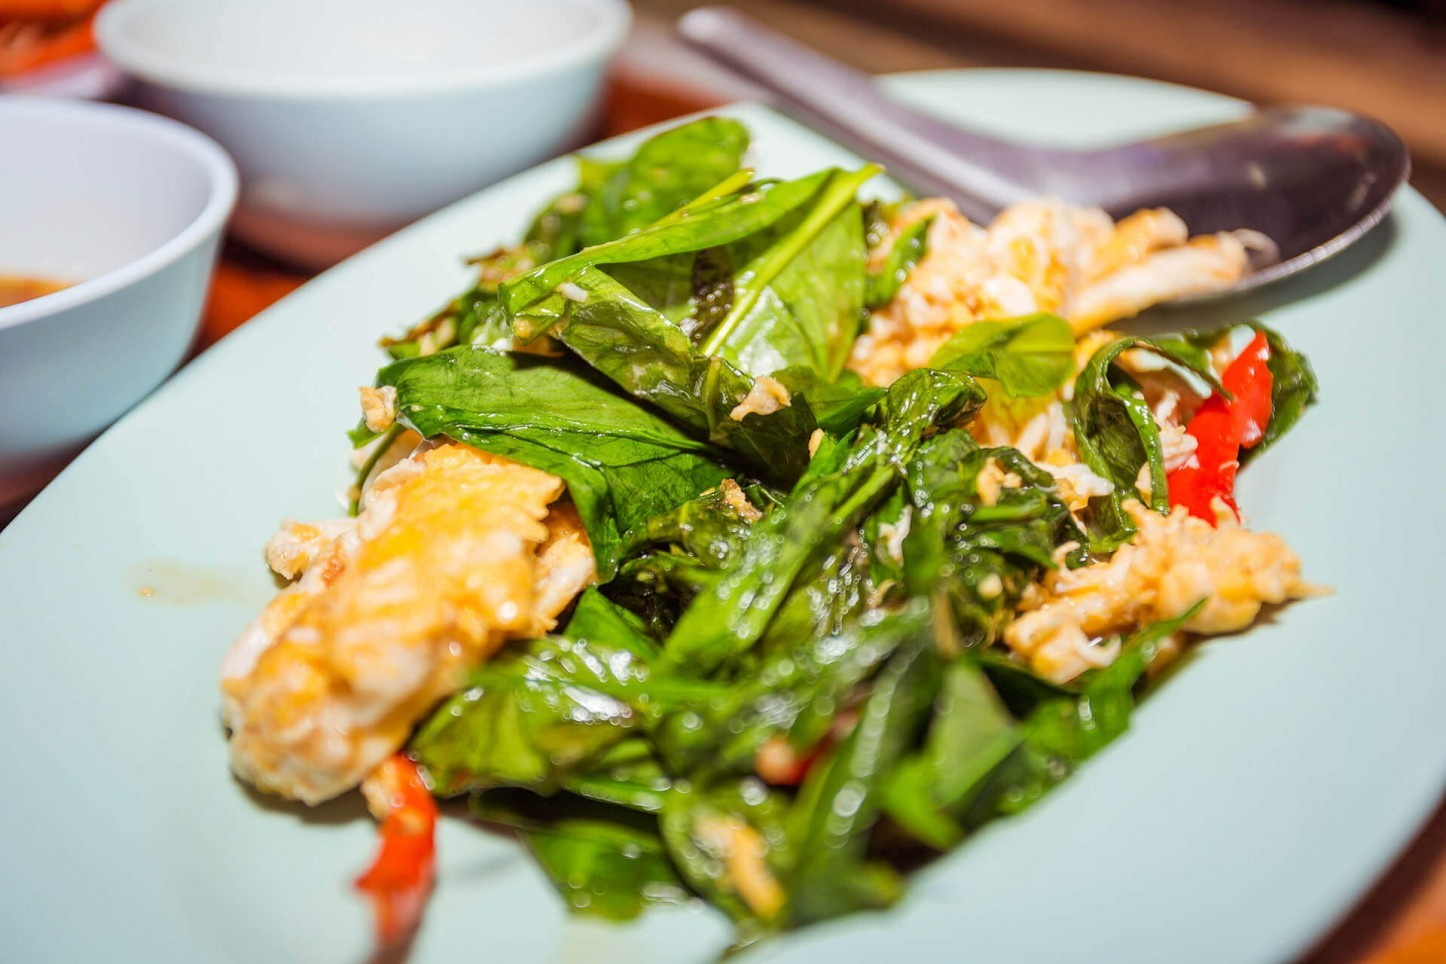 Moor Mu Dong restaurant